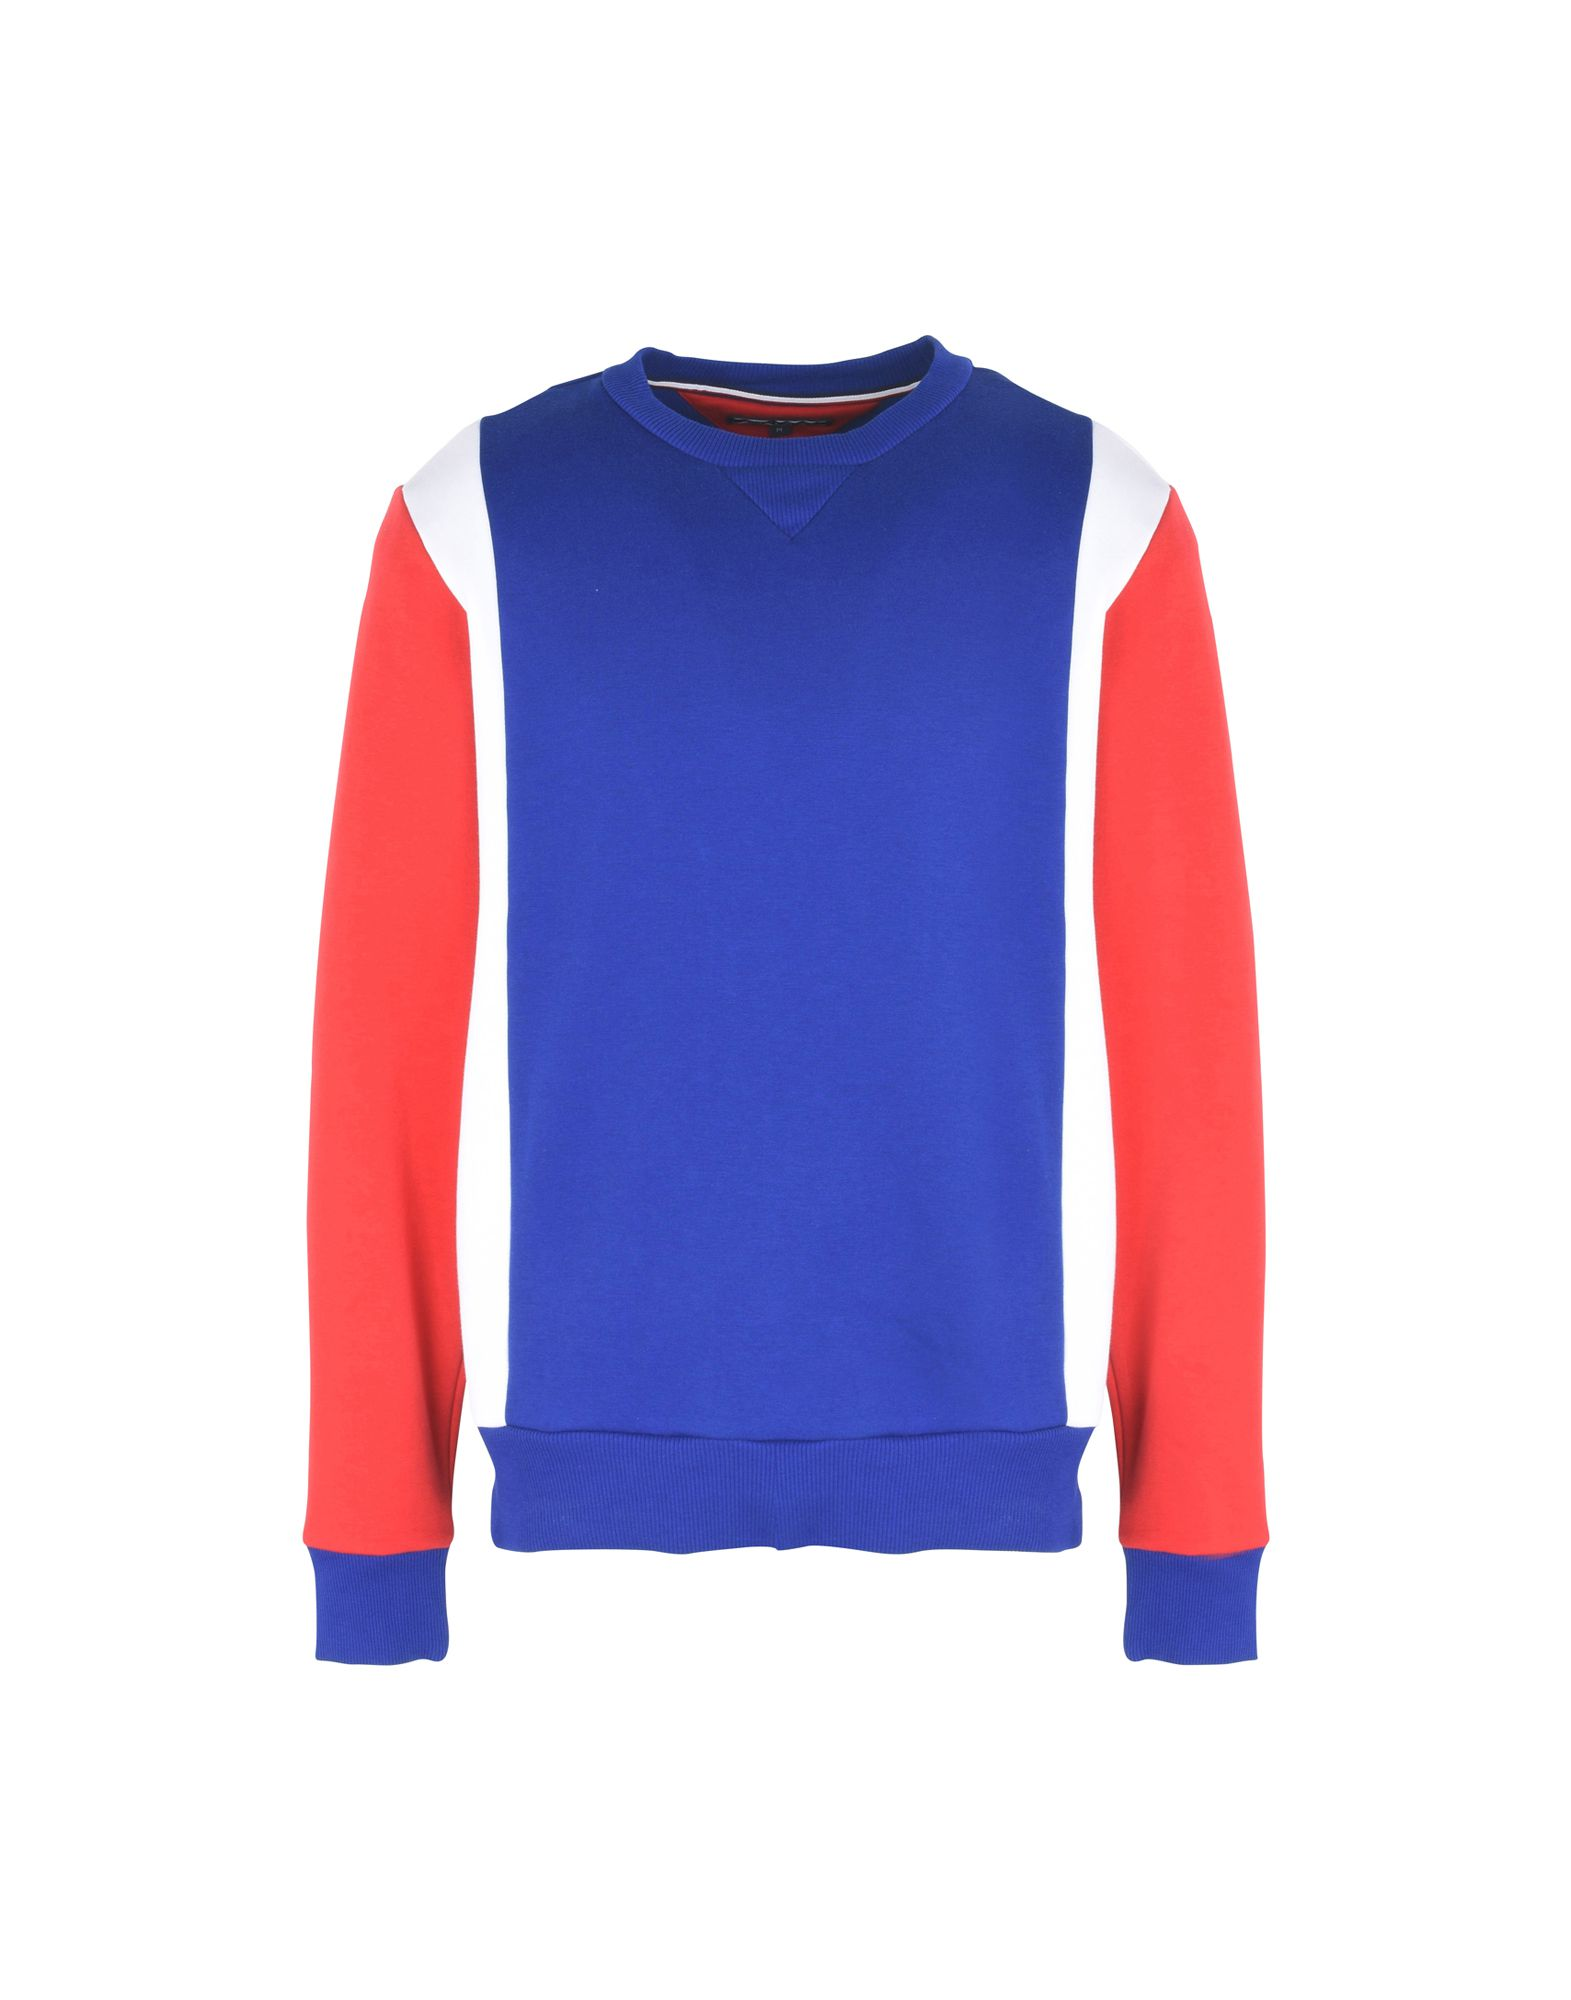 Felpa Tommy Hilfiger Vertical Cut Sewn Sweatshirt - Uomo - Acquista online su